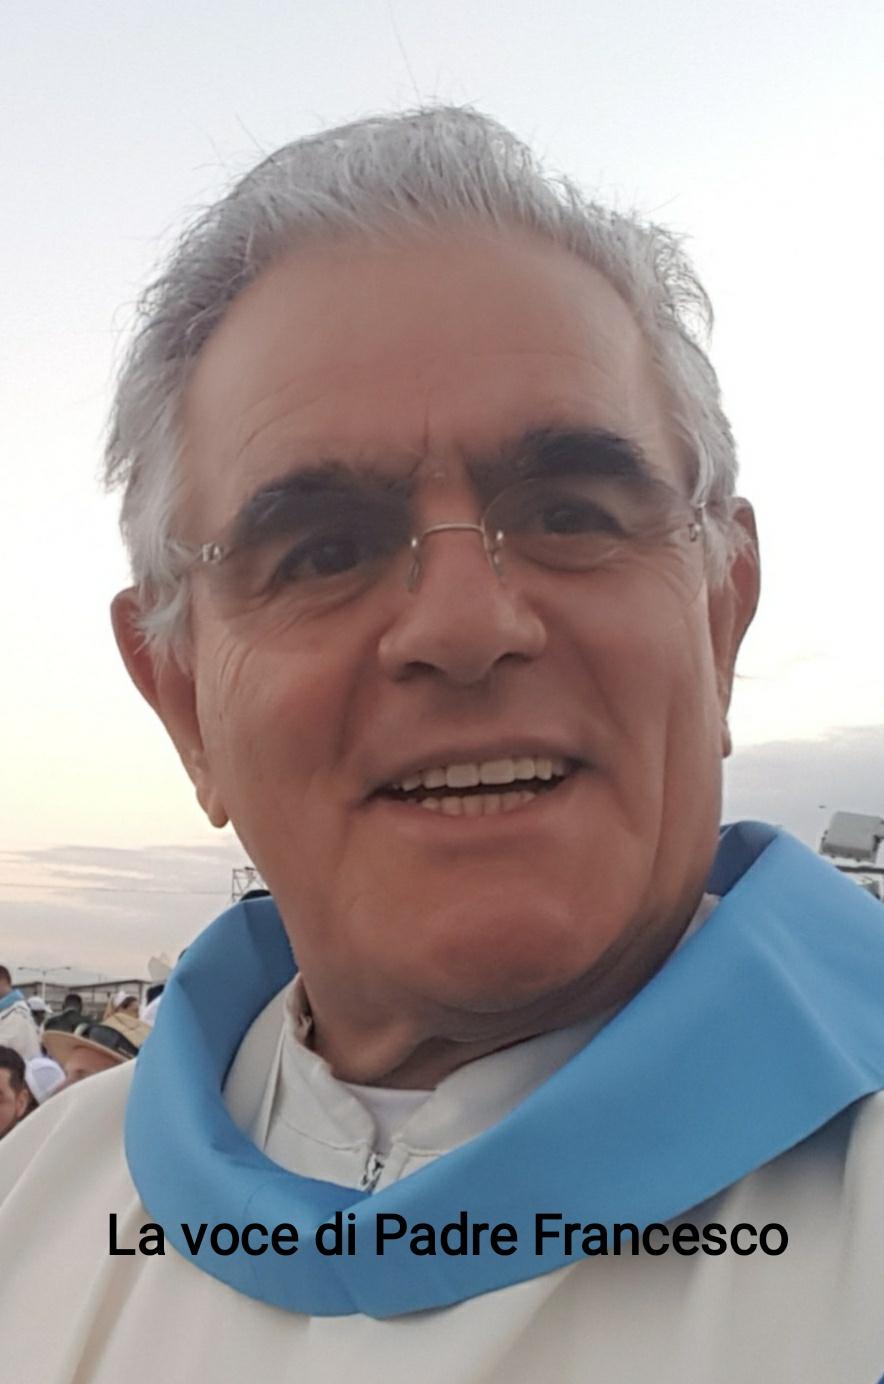 La Voce di Padre Francesco